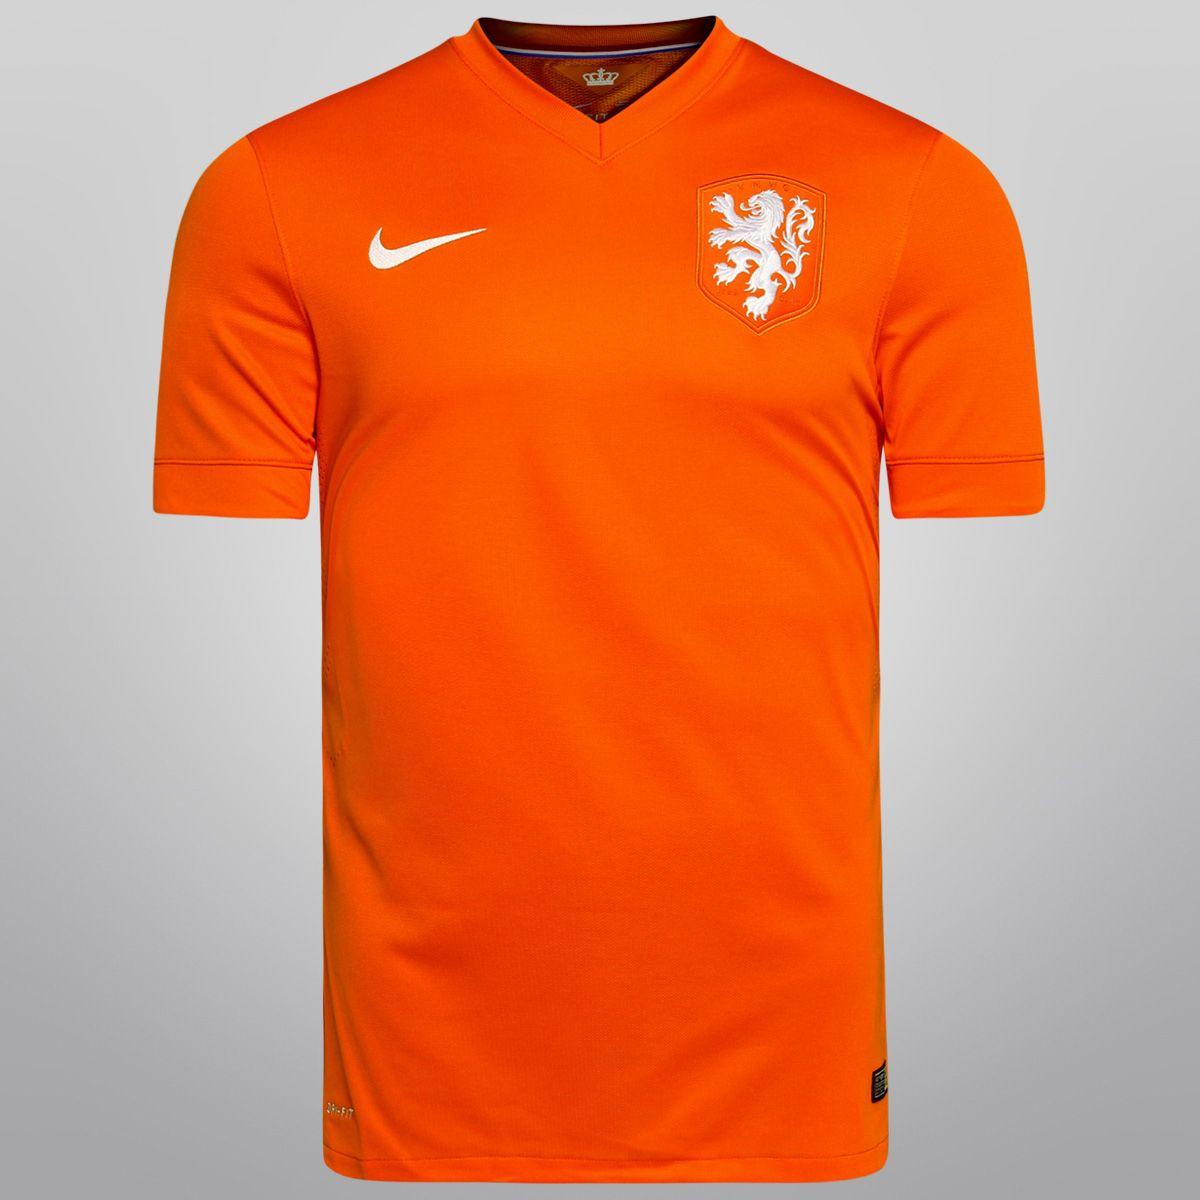 Netshoes - Camisa Nike Seleção Holanda Home 2014 s nº - Torcedor ... eab9a2534fb23